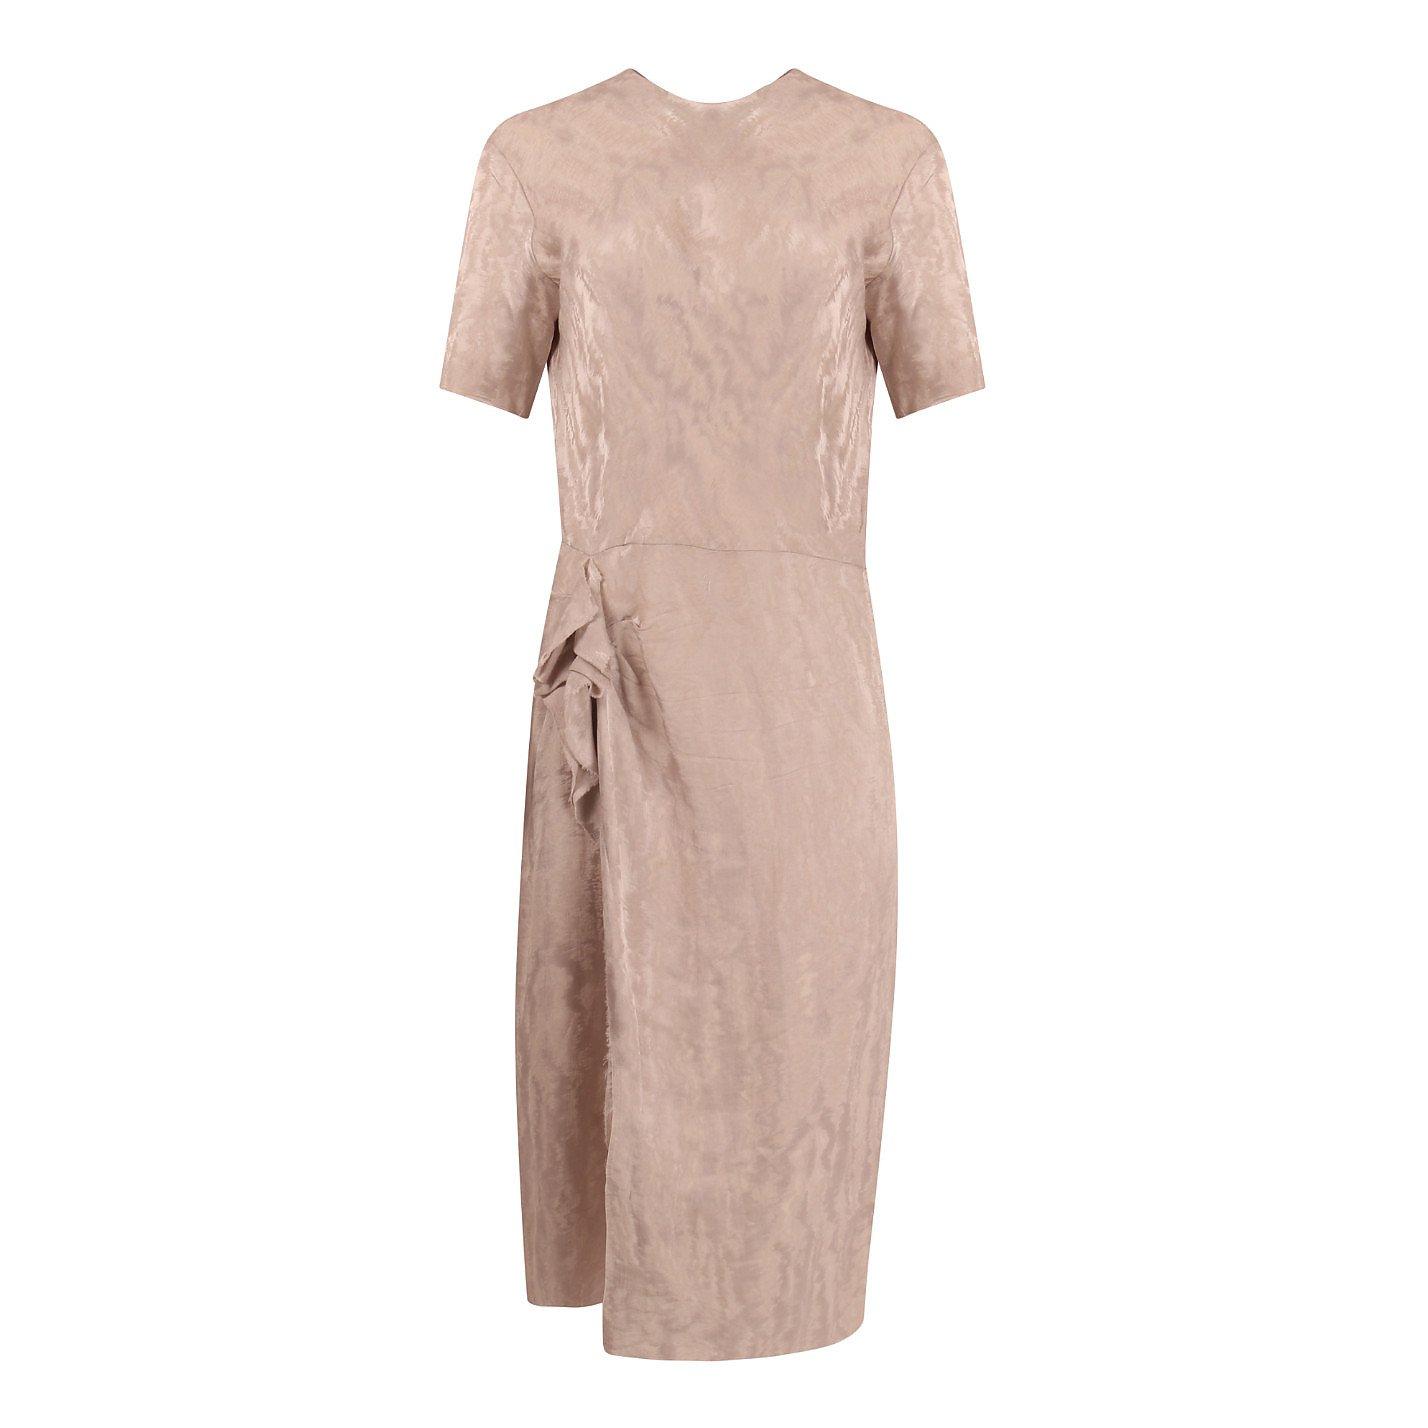 Isabel Marant Short Sleeve Midi Dress